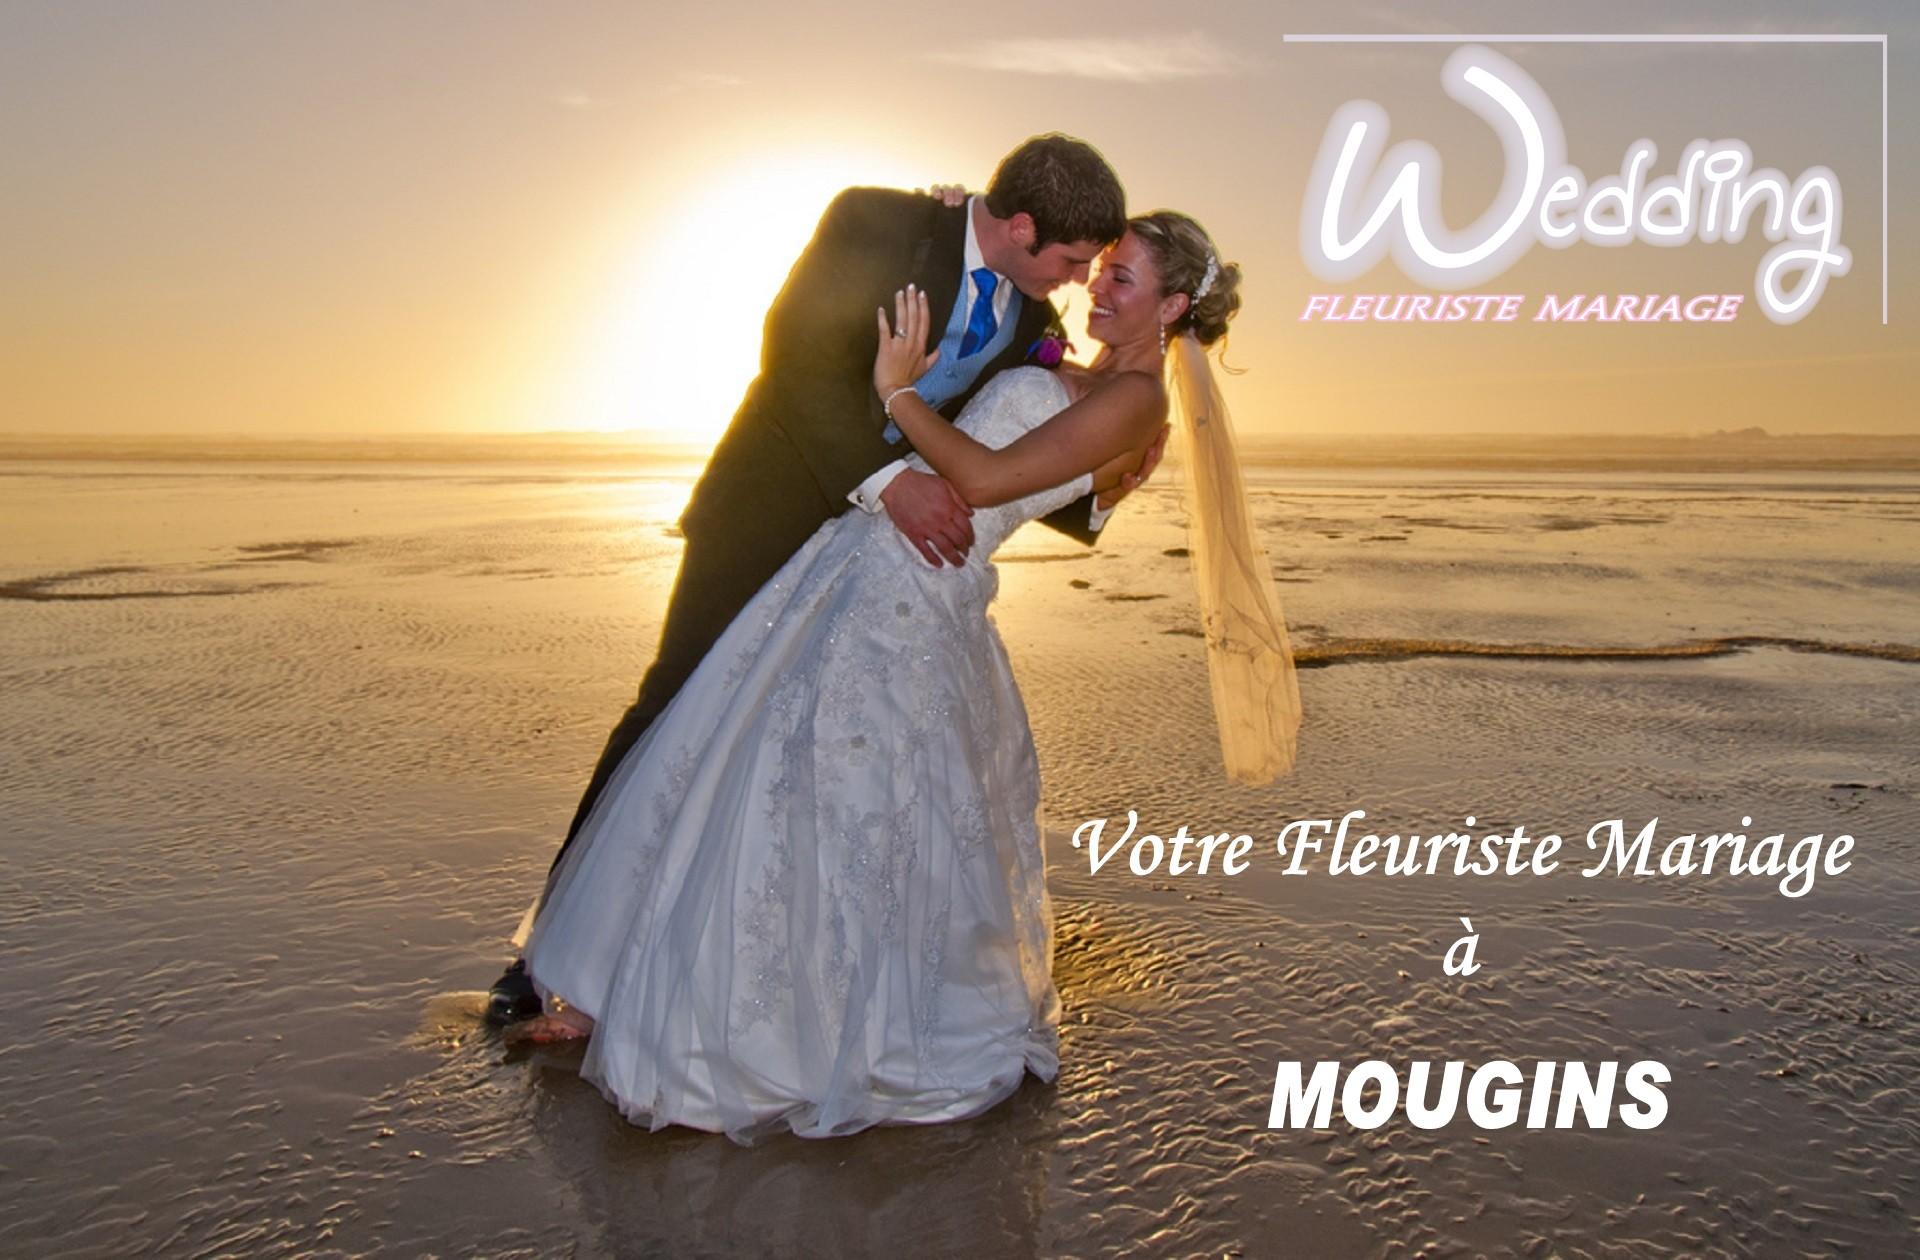 FLEURISTE MARIAGE MOUGINS - WEDDING PLANNER MOUGINS - TRAITEUR MOUGINS